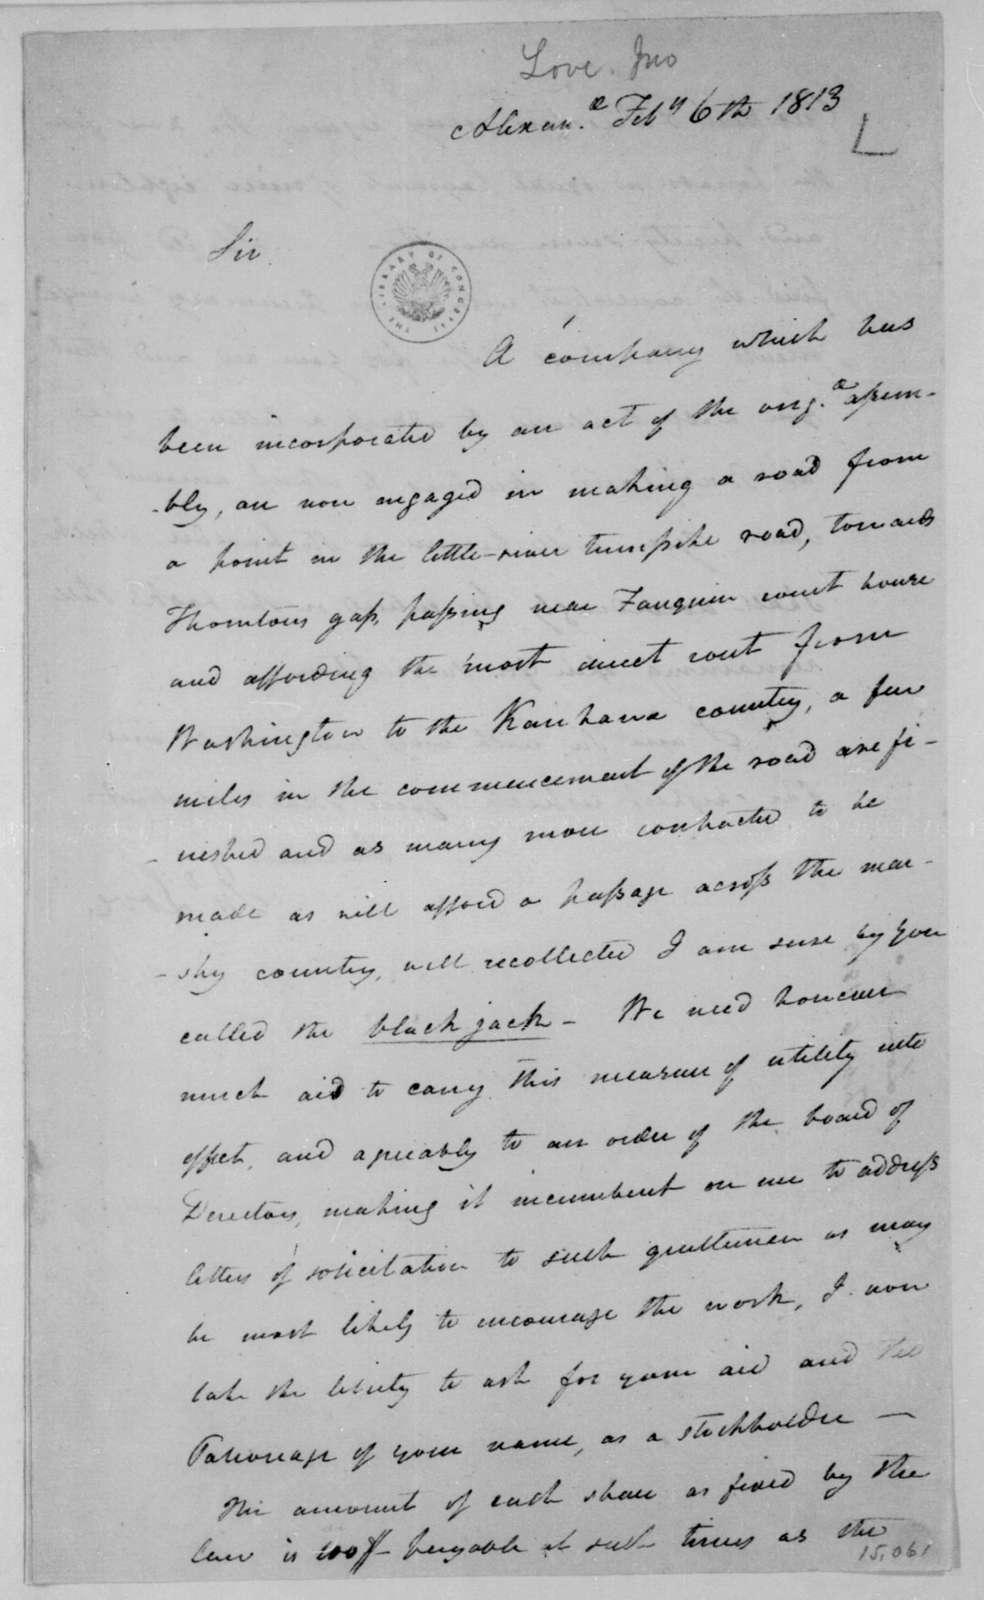 Jonathan Love to James Madison, February 6, 1813.